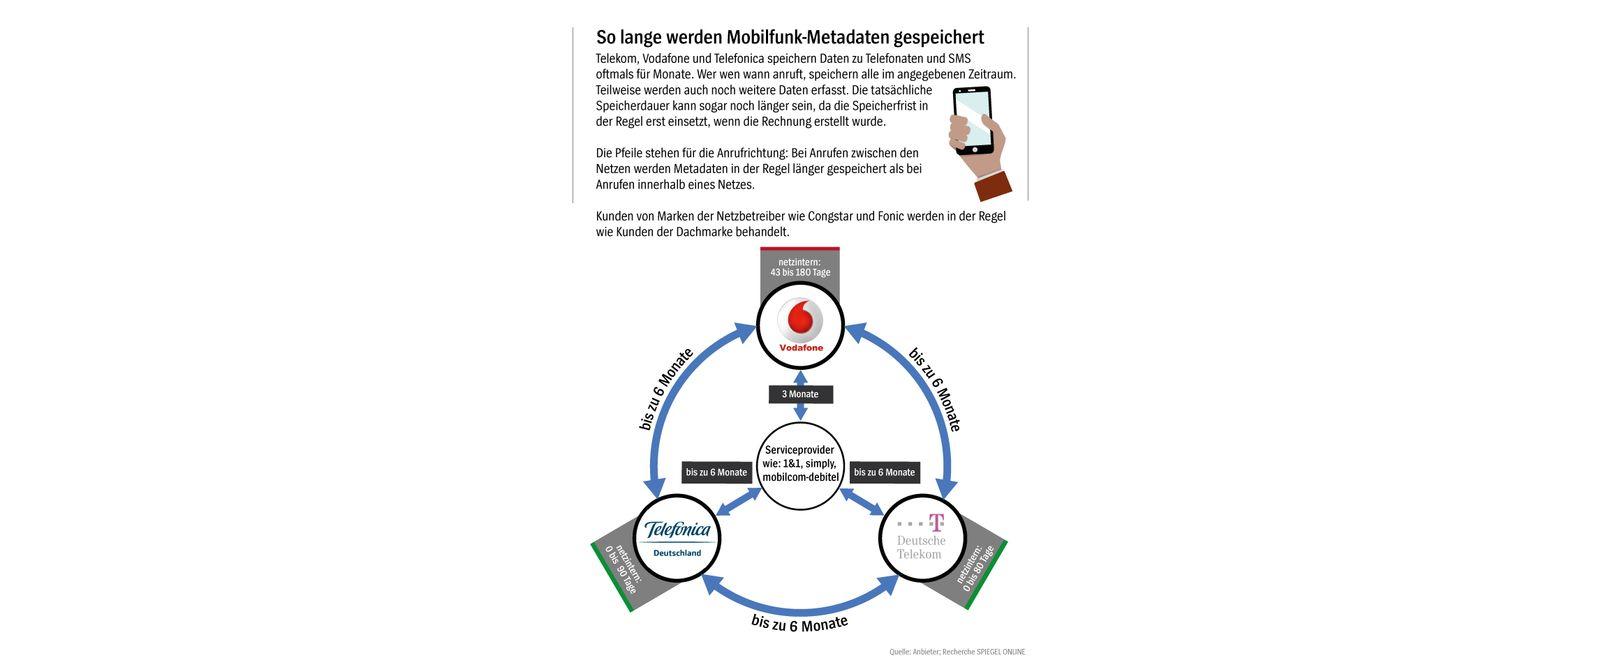 Mobile Metadaten